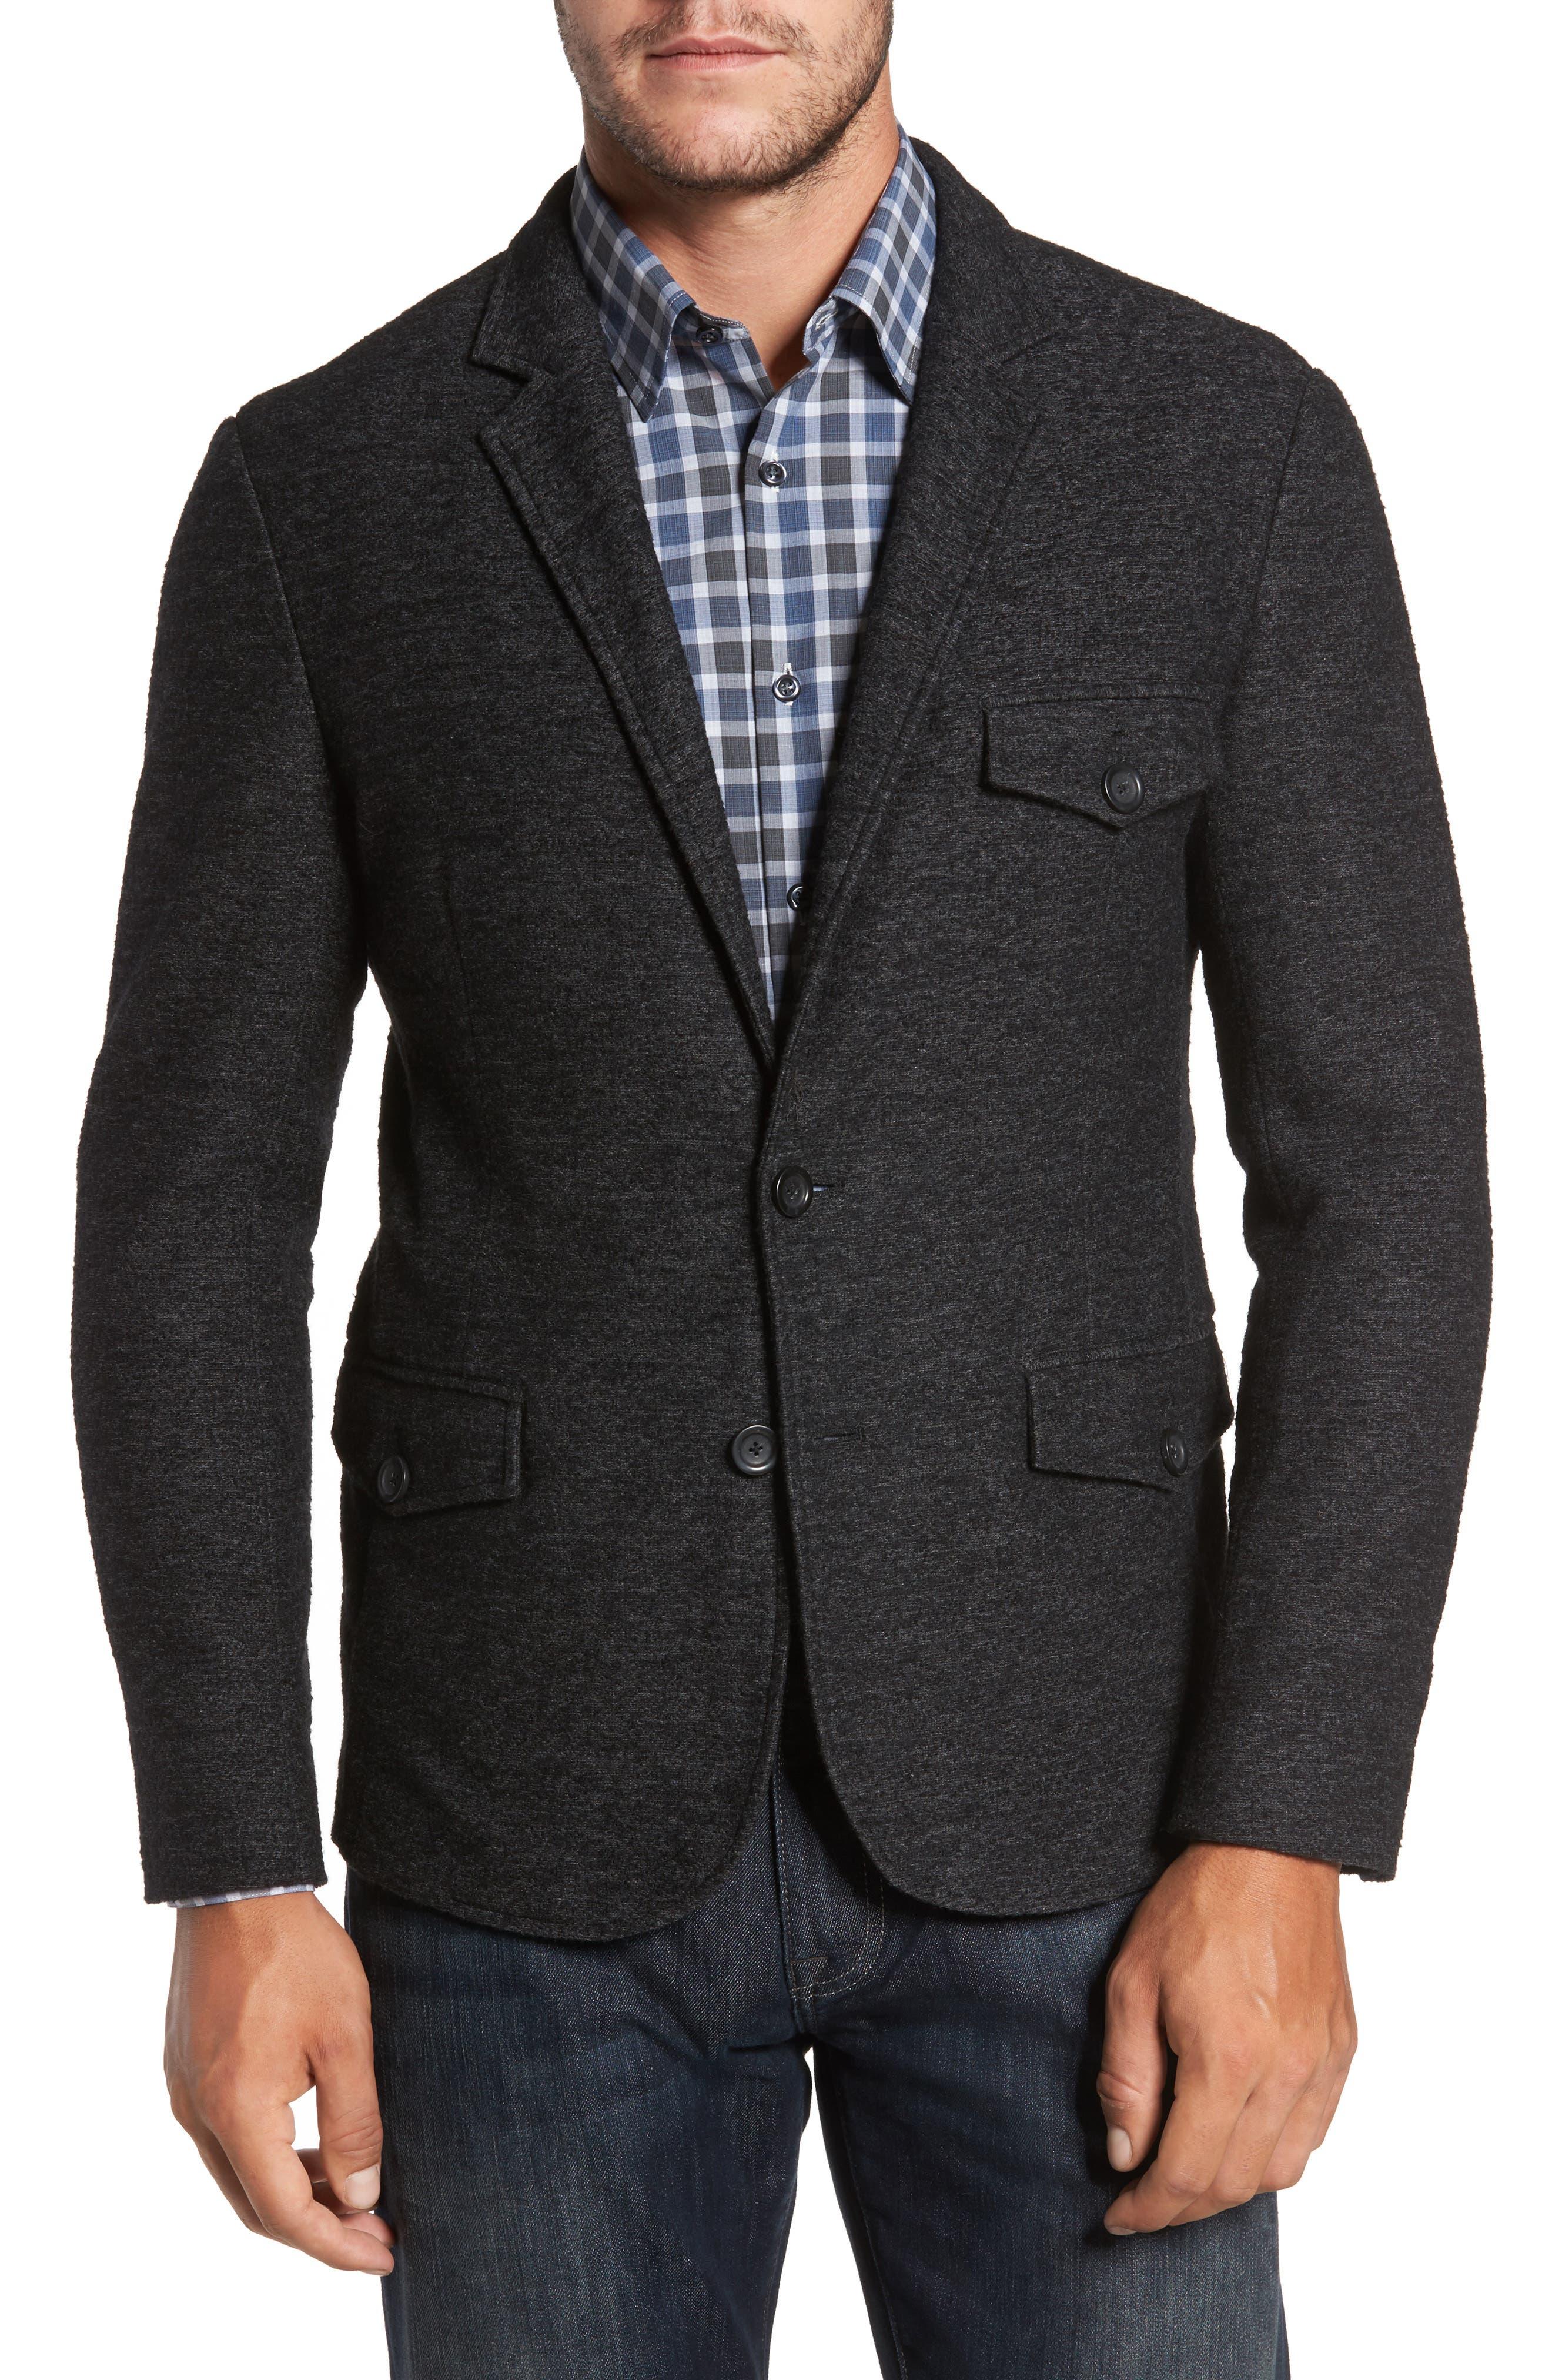 Robert Barakett Gramercy Knit Jacket